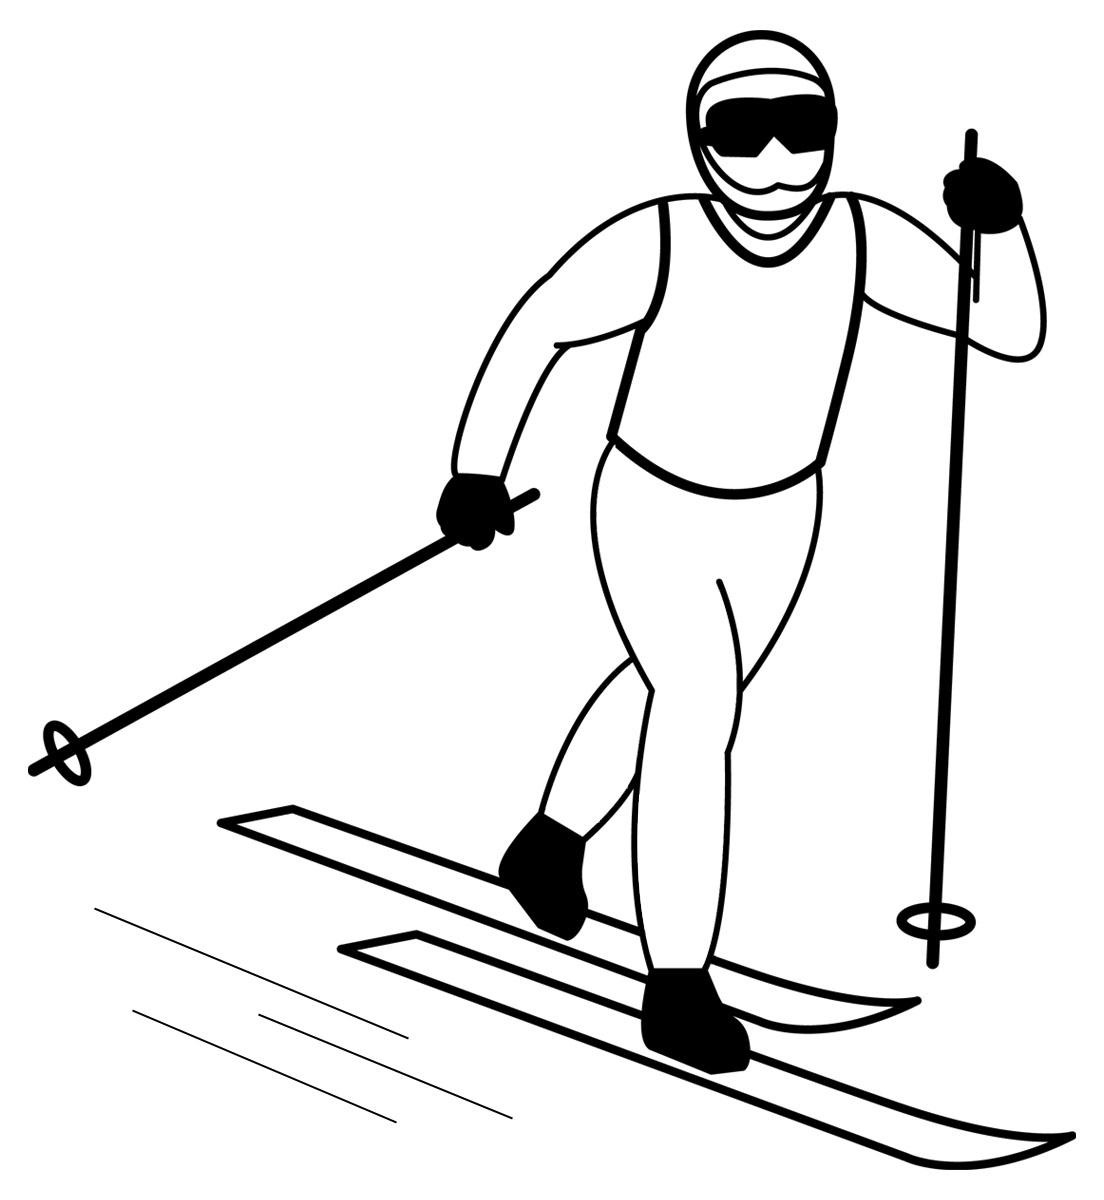 Free snow ski cliparts. Skis clipart skiing person